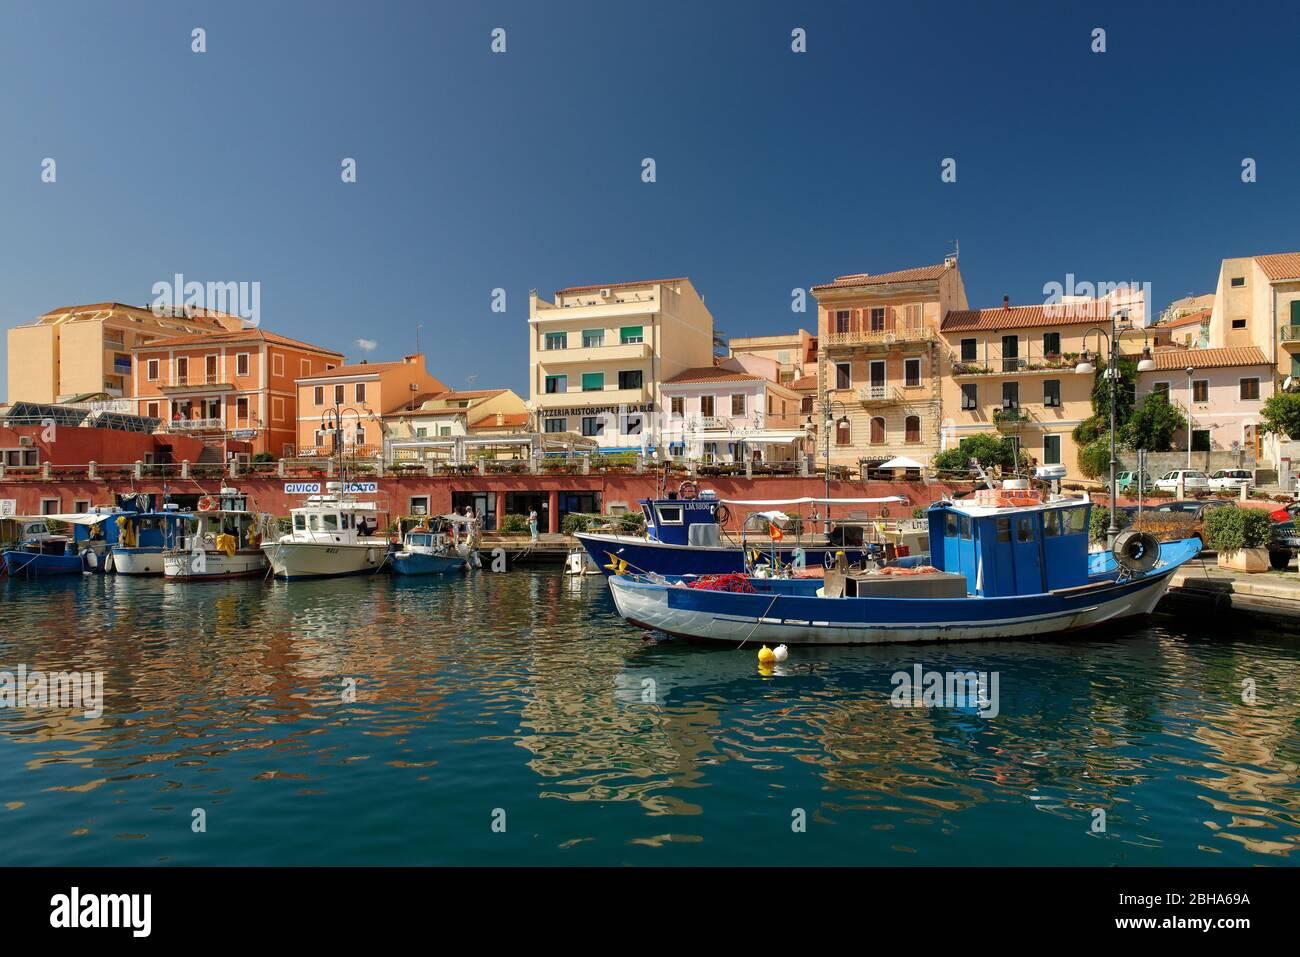 Old town and harbor of La Maddalena, Mediterranean sea, Olbia-Tempio province, Sardinia, Italy Stock Photo